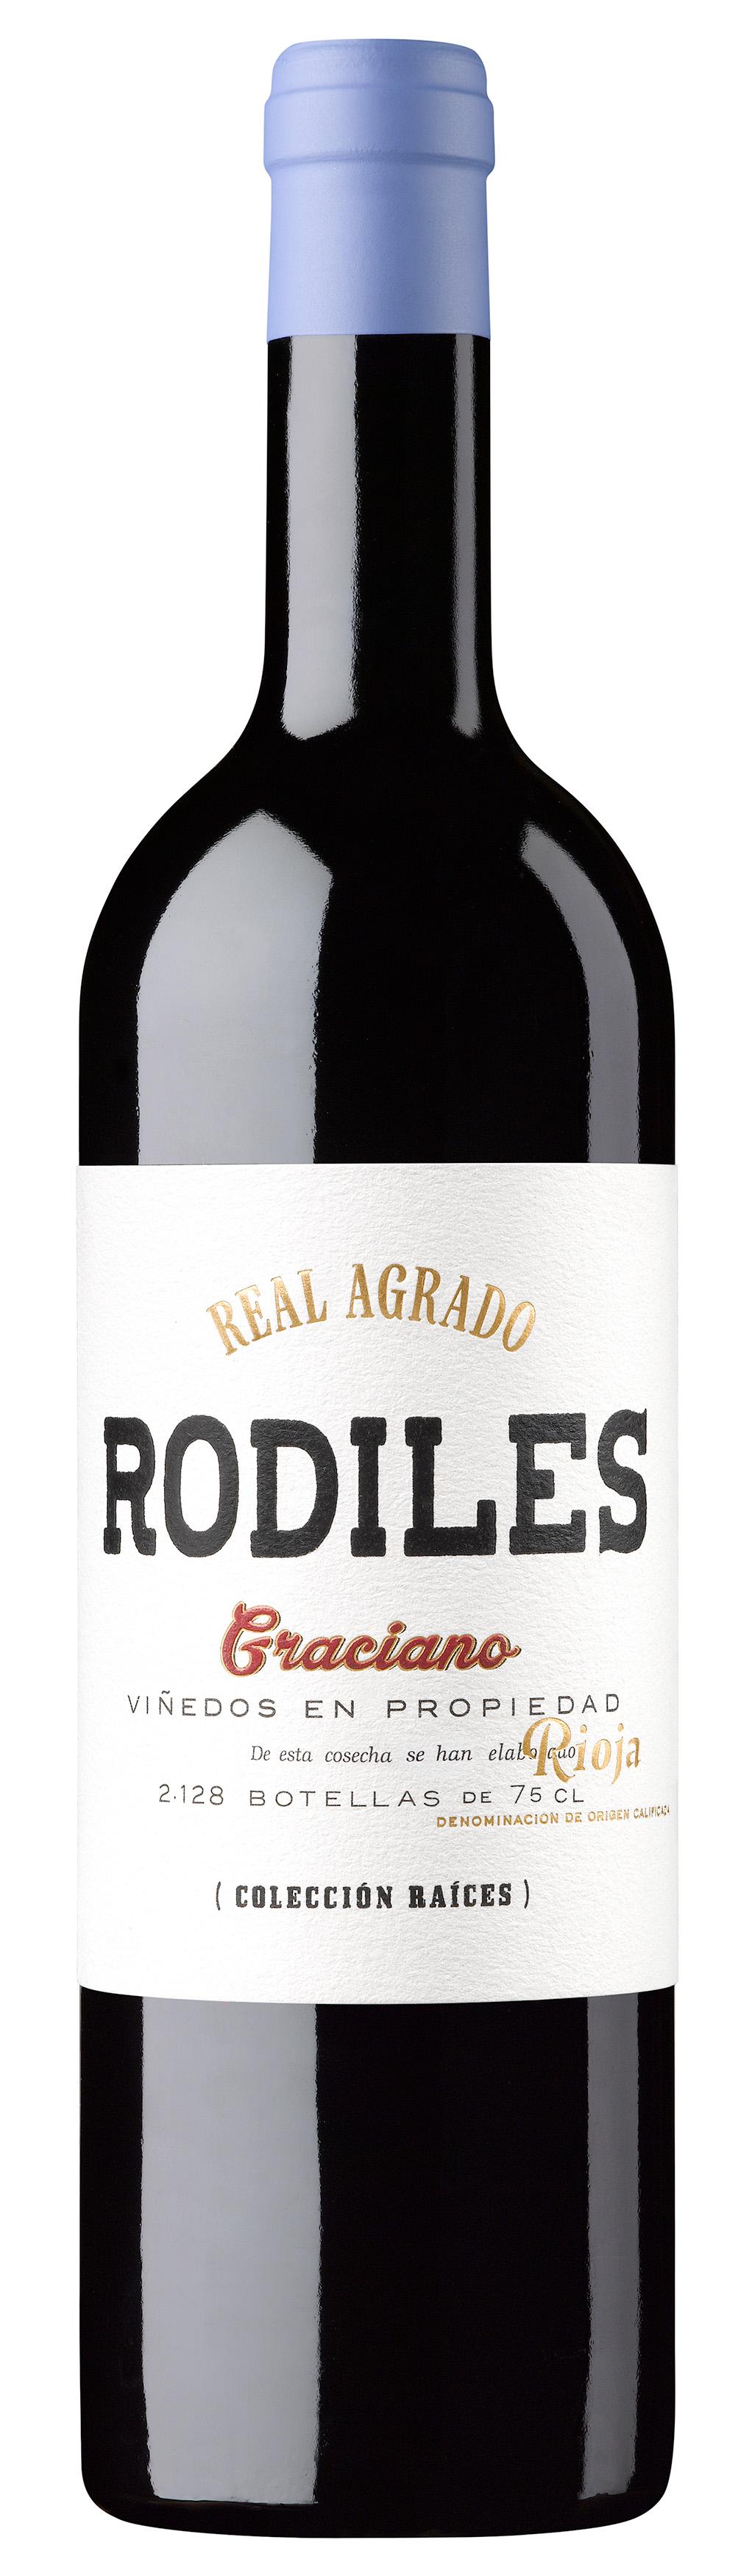 Rodiles